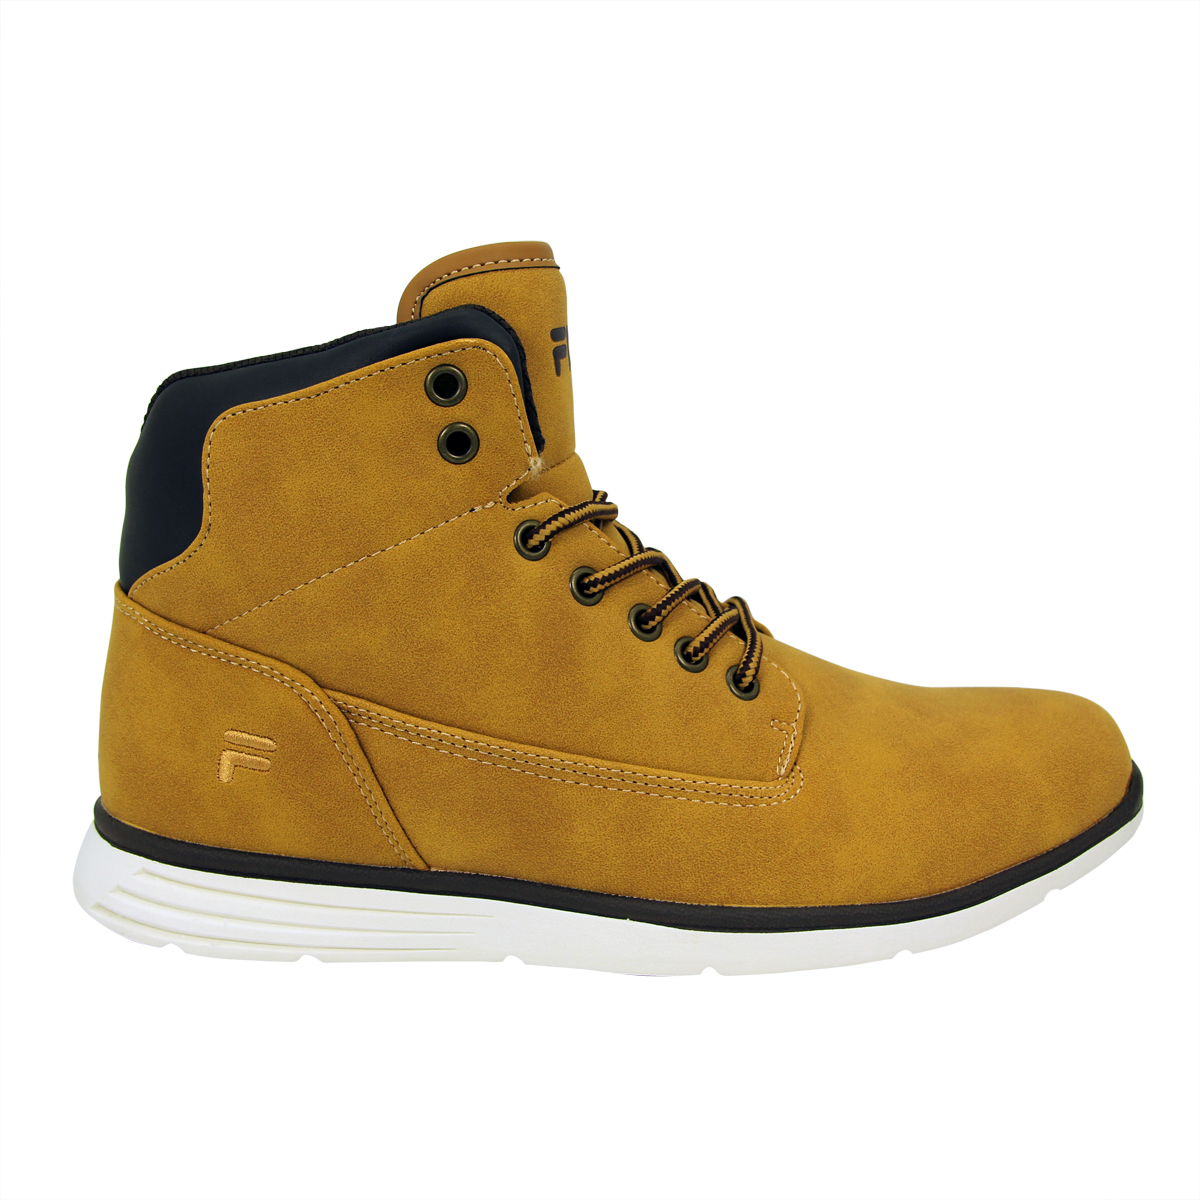 FILA Lance Mid Mens zapatillas zapatos New